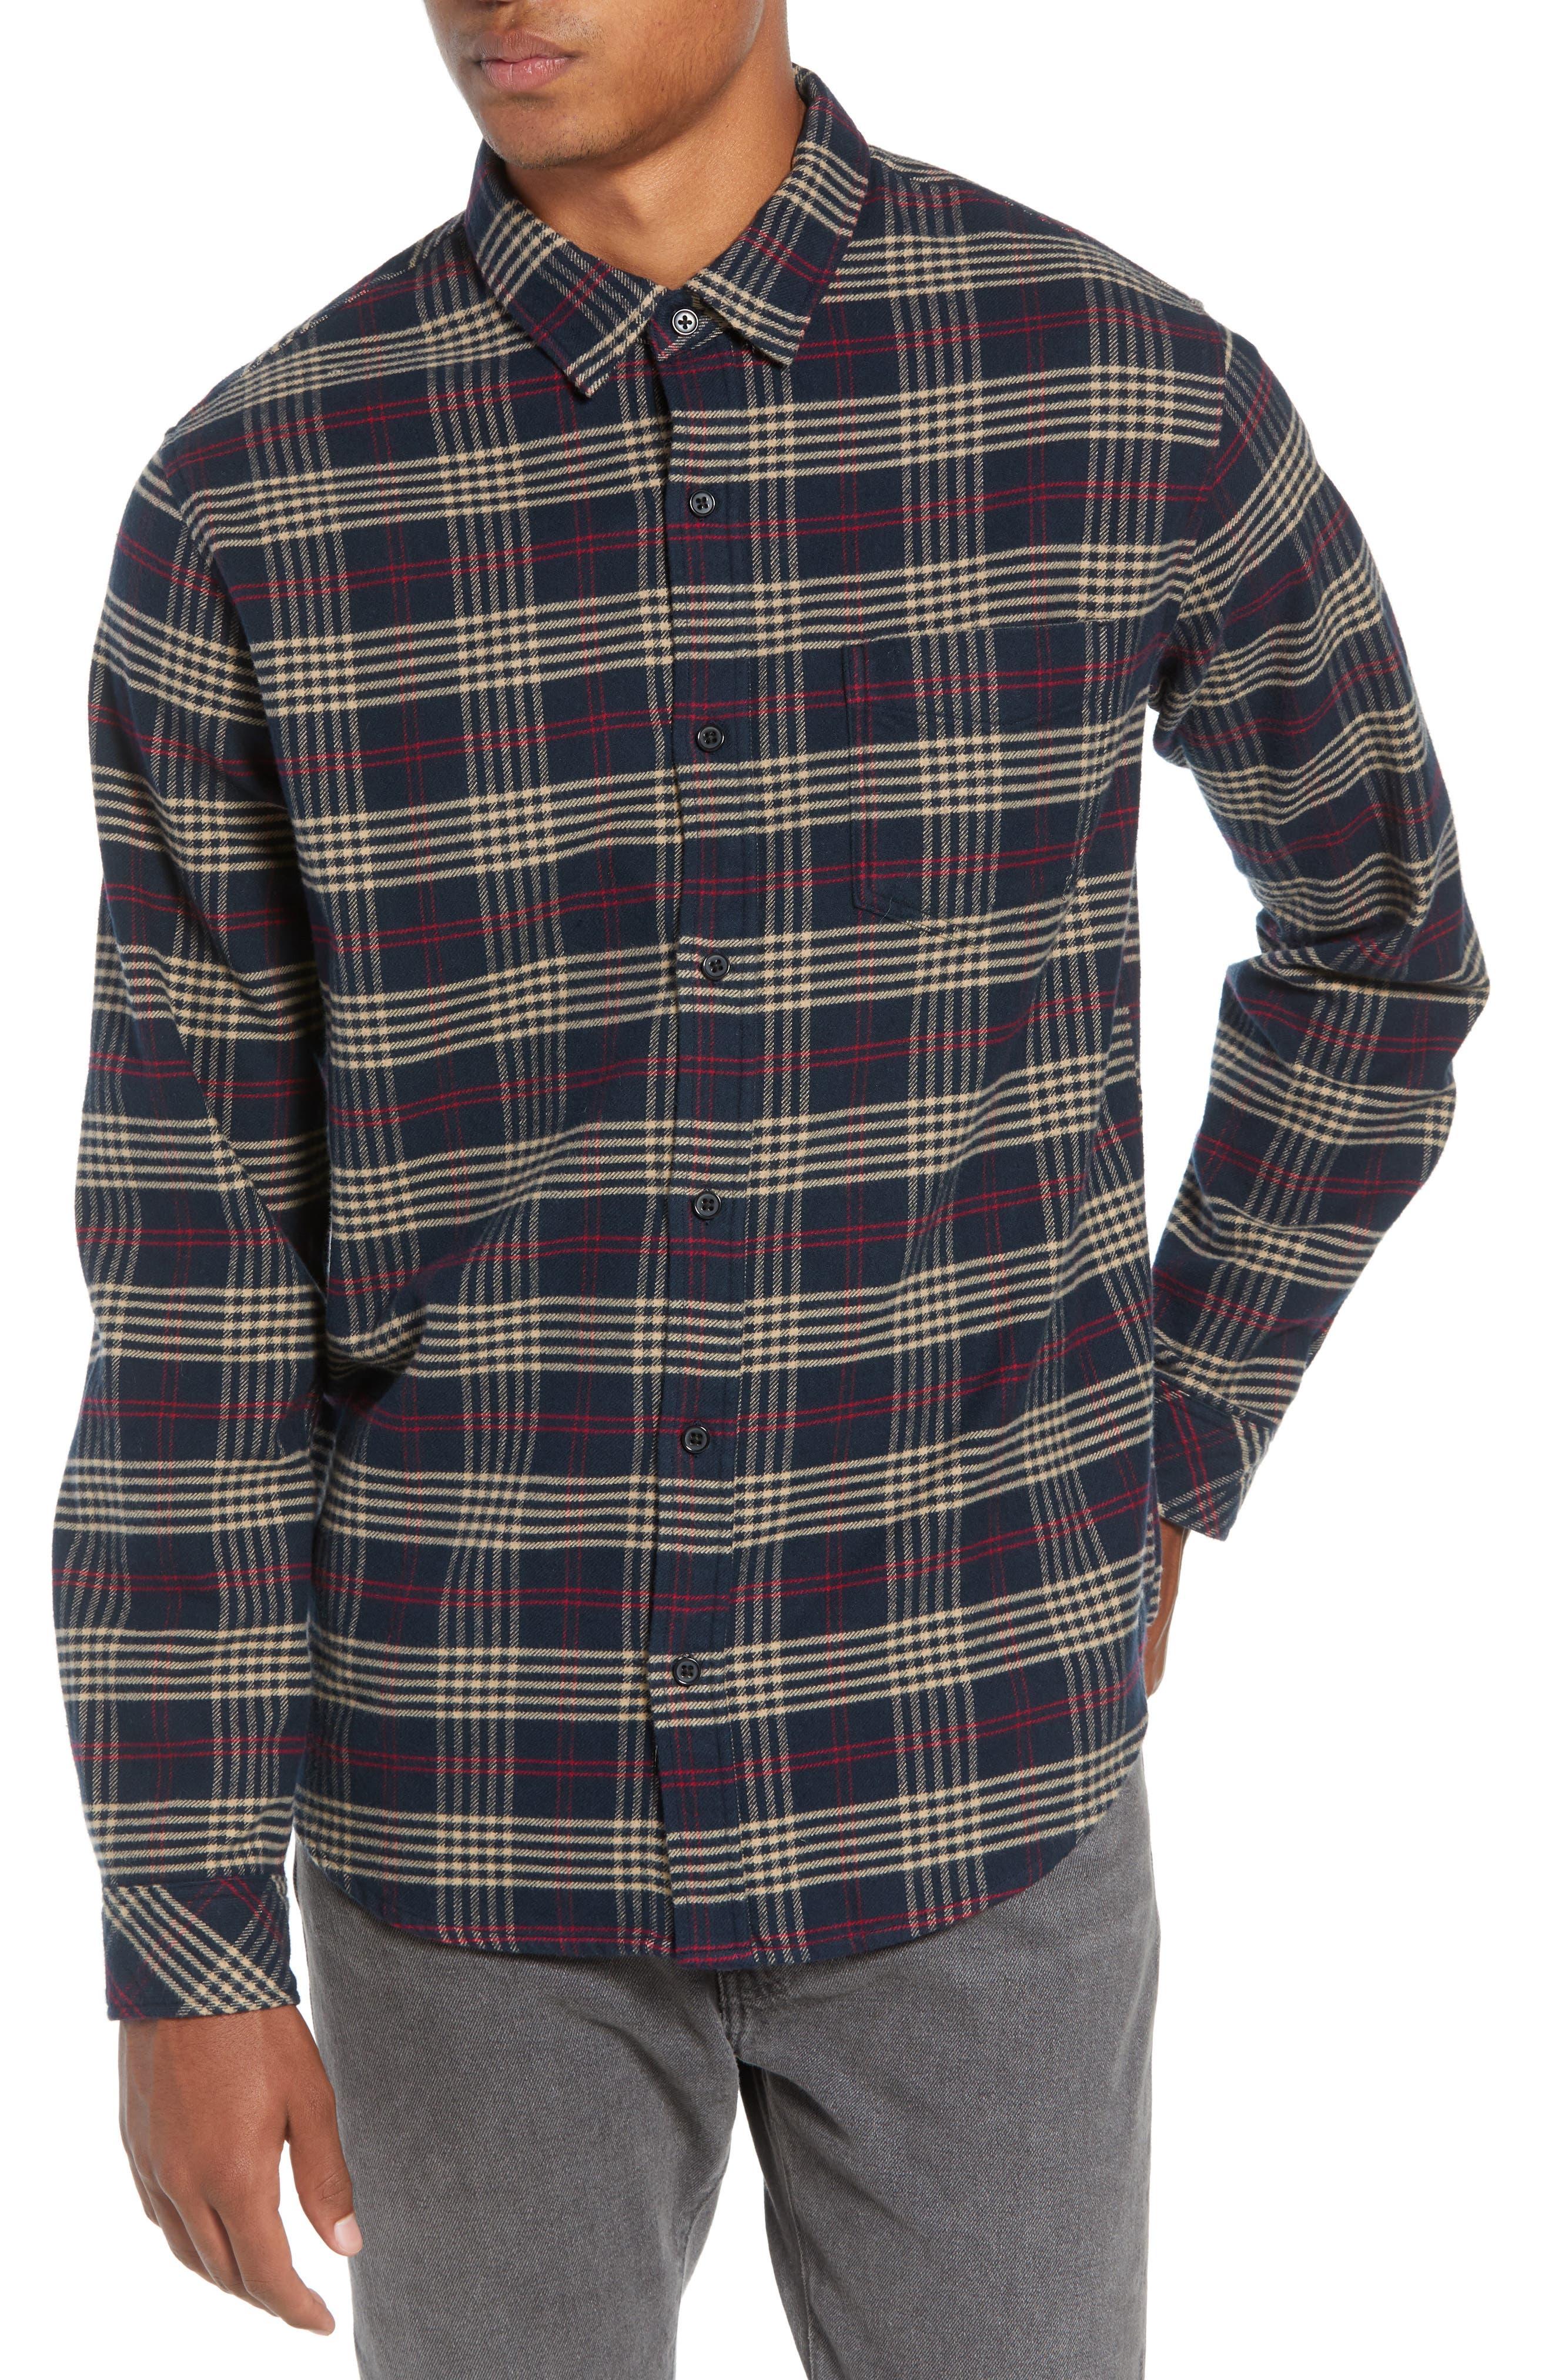 Forrest Slim Fit Plaid Flannel Sport Shirt,                         Main,                         color, NAVY/RED/ELM